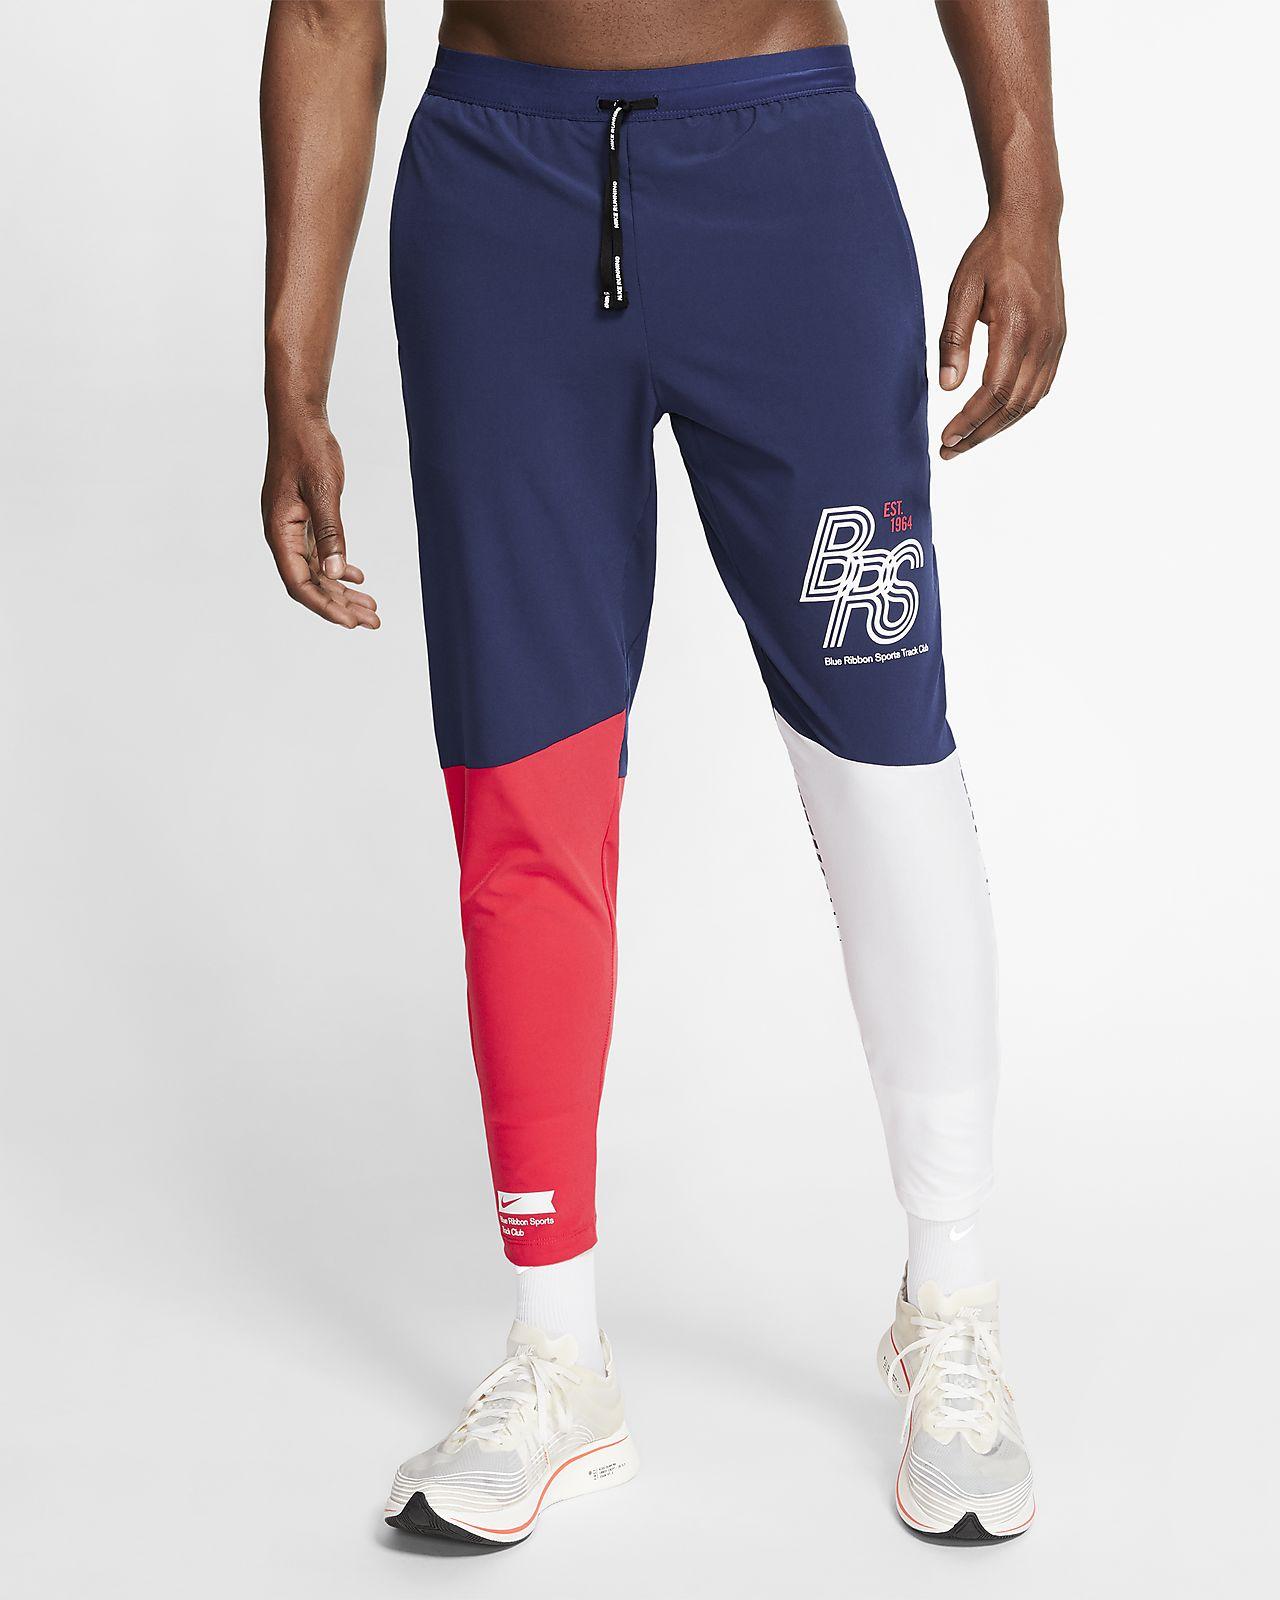 Pantalones de Running Nike Blue Ribbon Sports